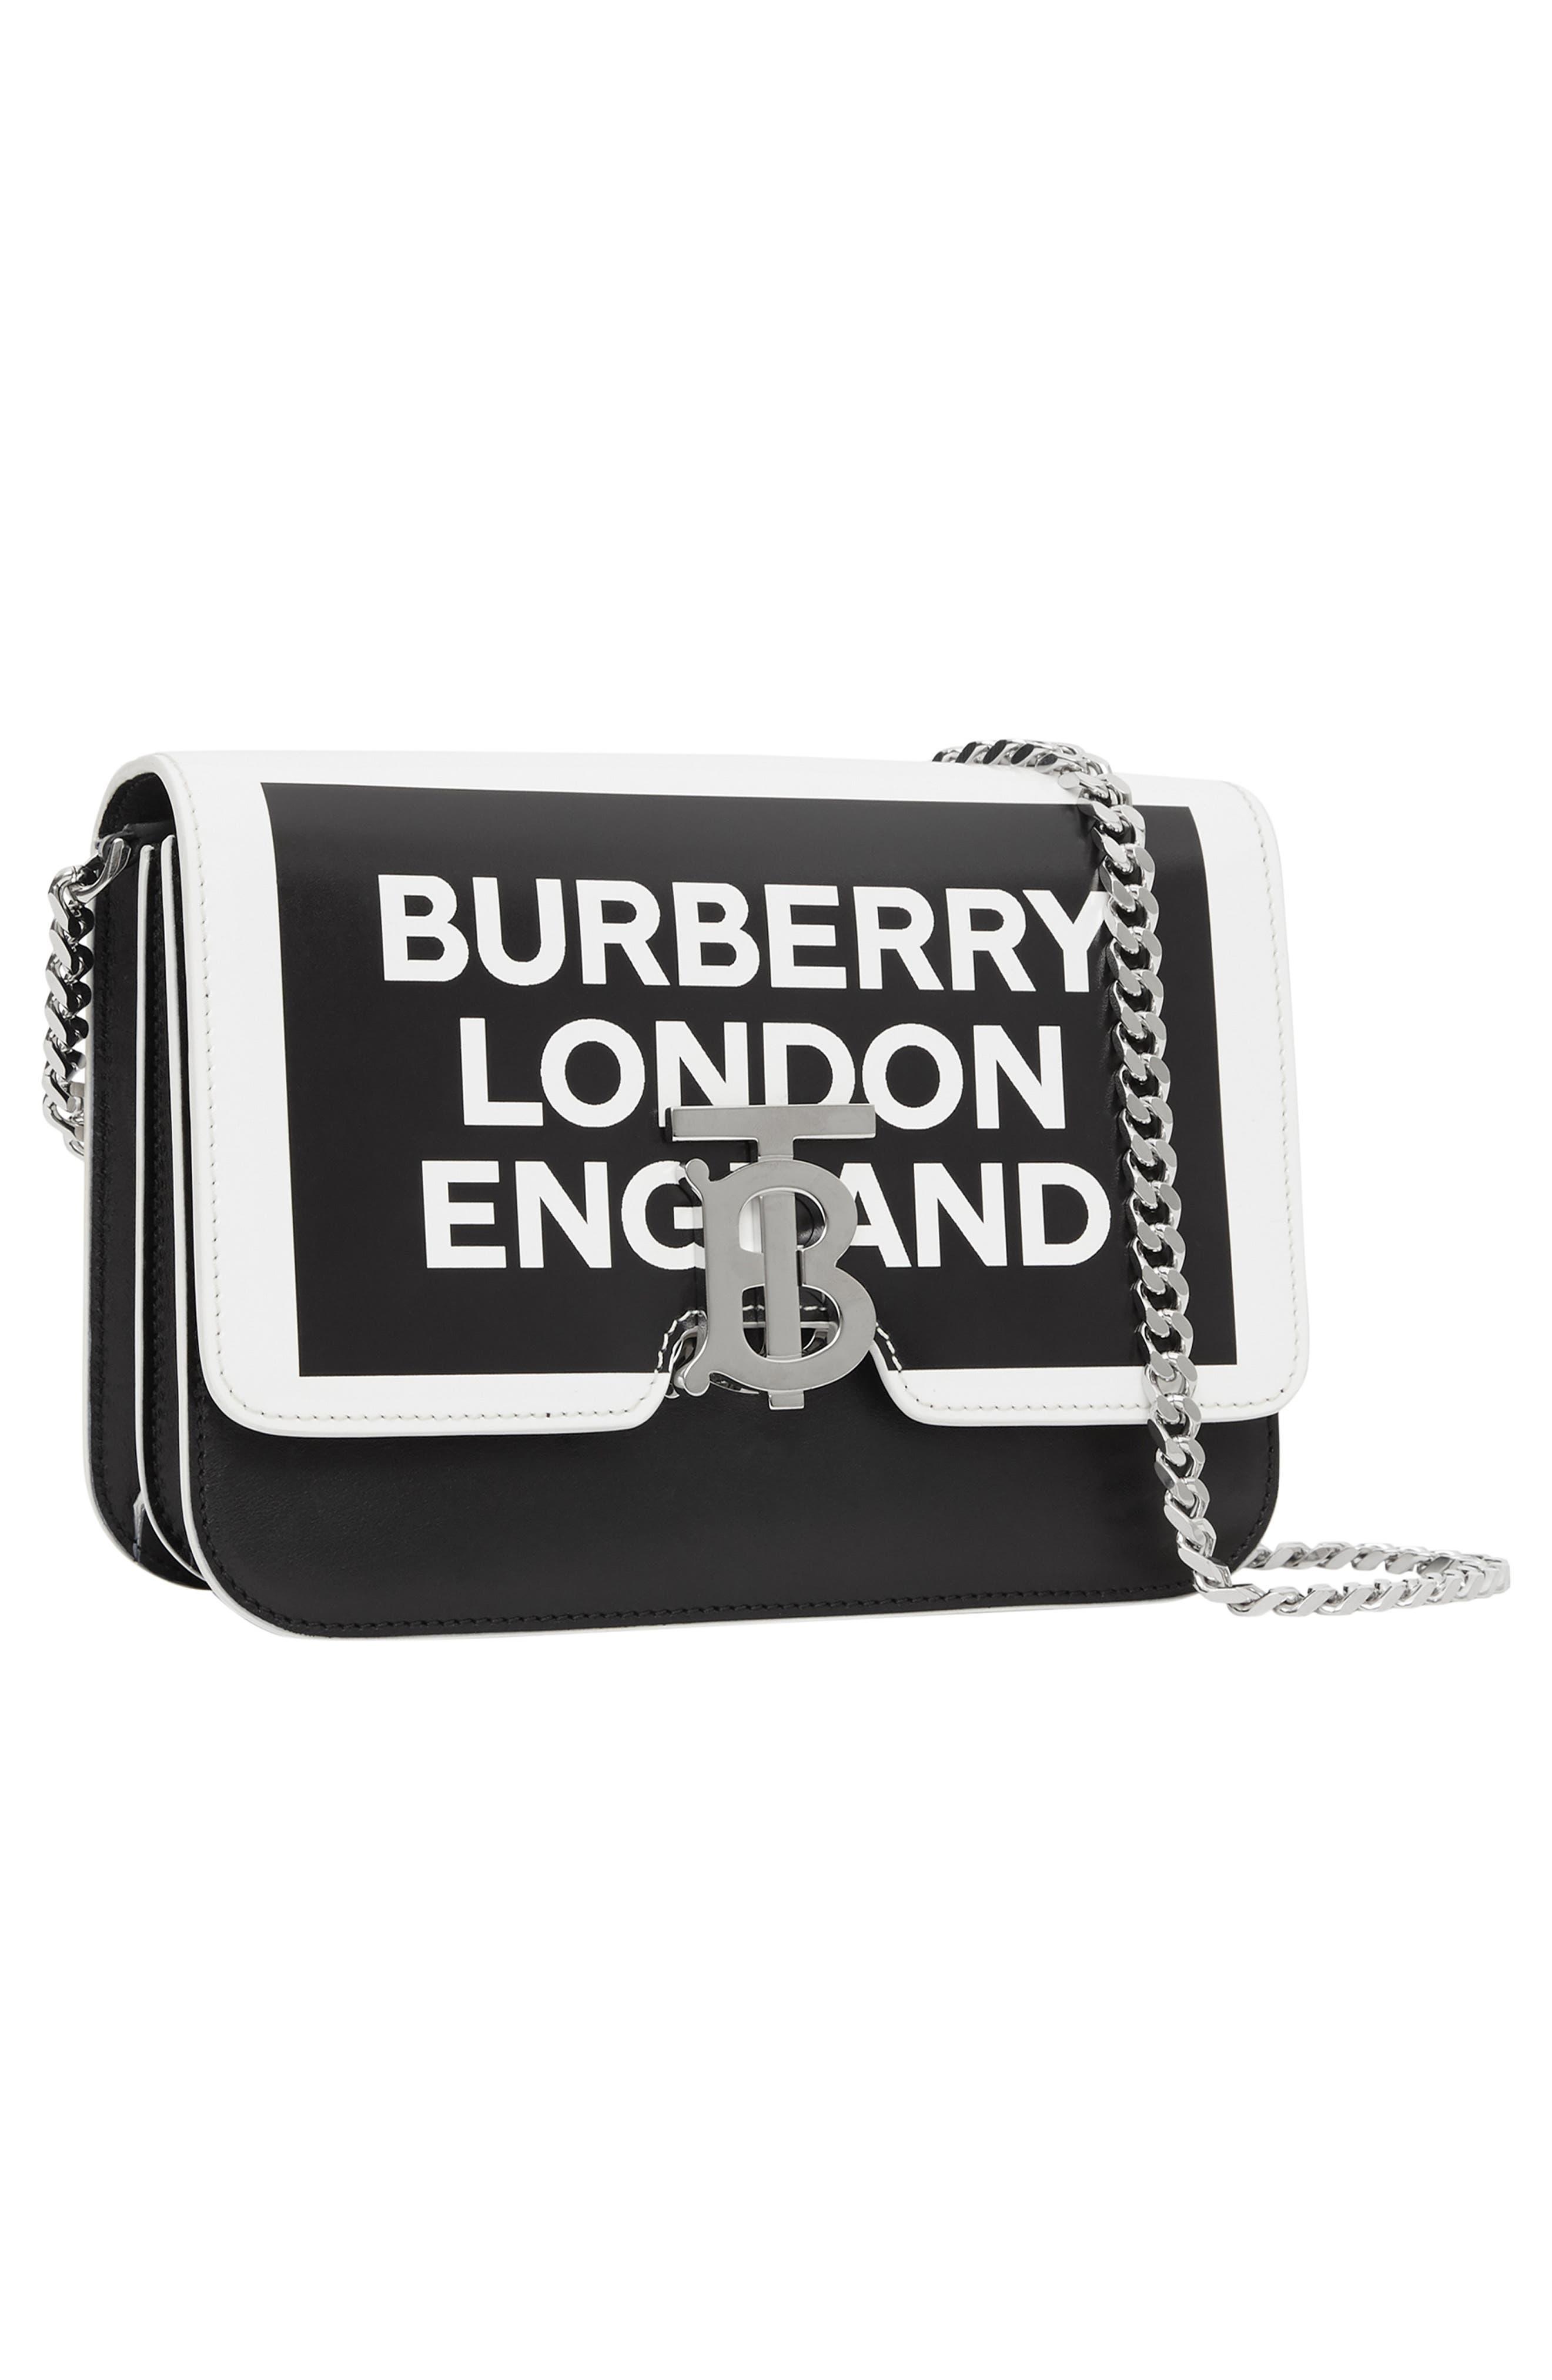 BURBERRY,                             Small Painted Edge Logo TB Crossbody Bag,                             Alternate thumbnail 6, color,                             BLACK/ WHITE